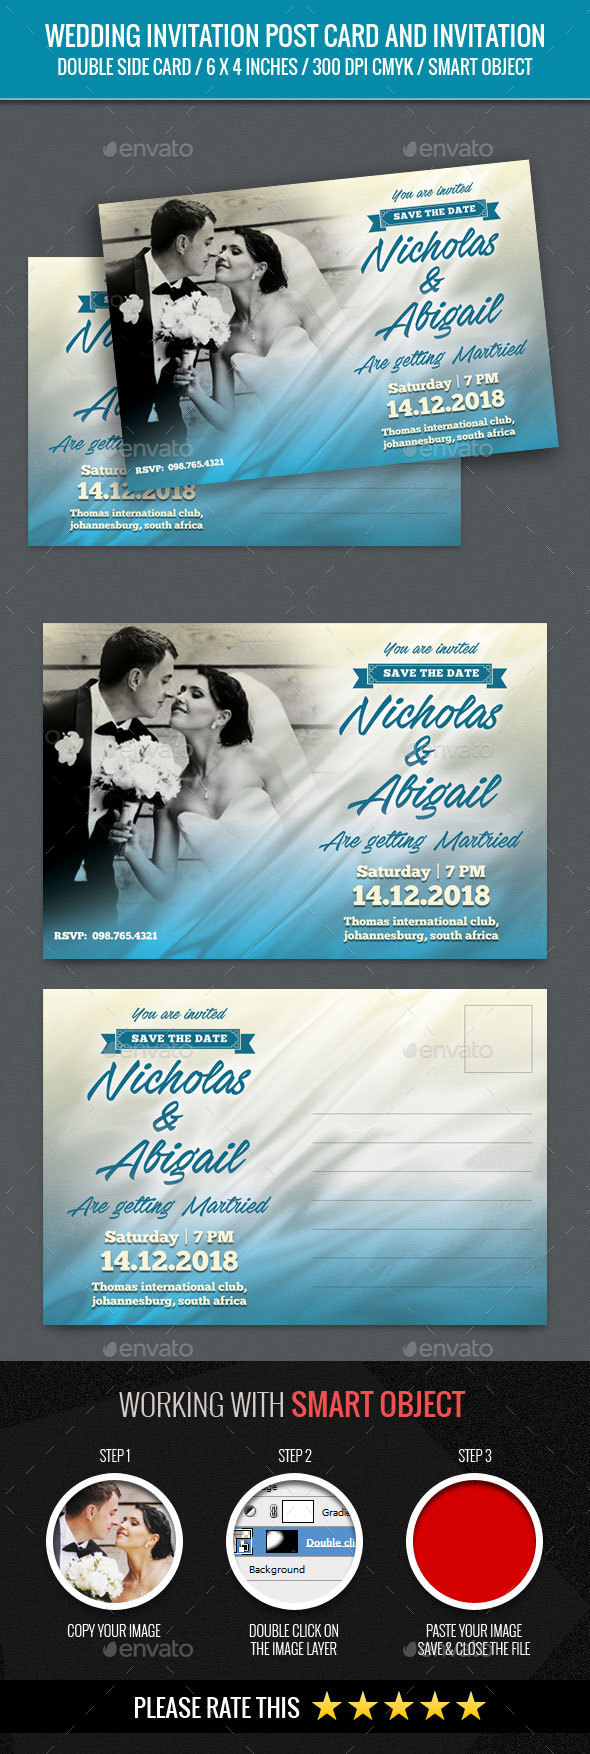 Wedding Invitation Post Card - Weddings Cards & Invites